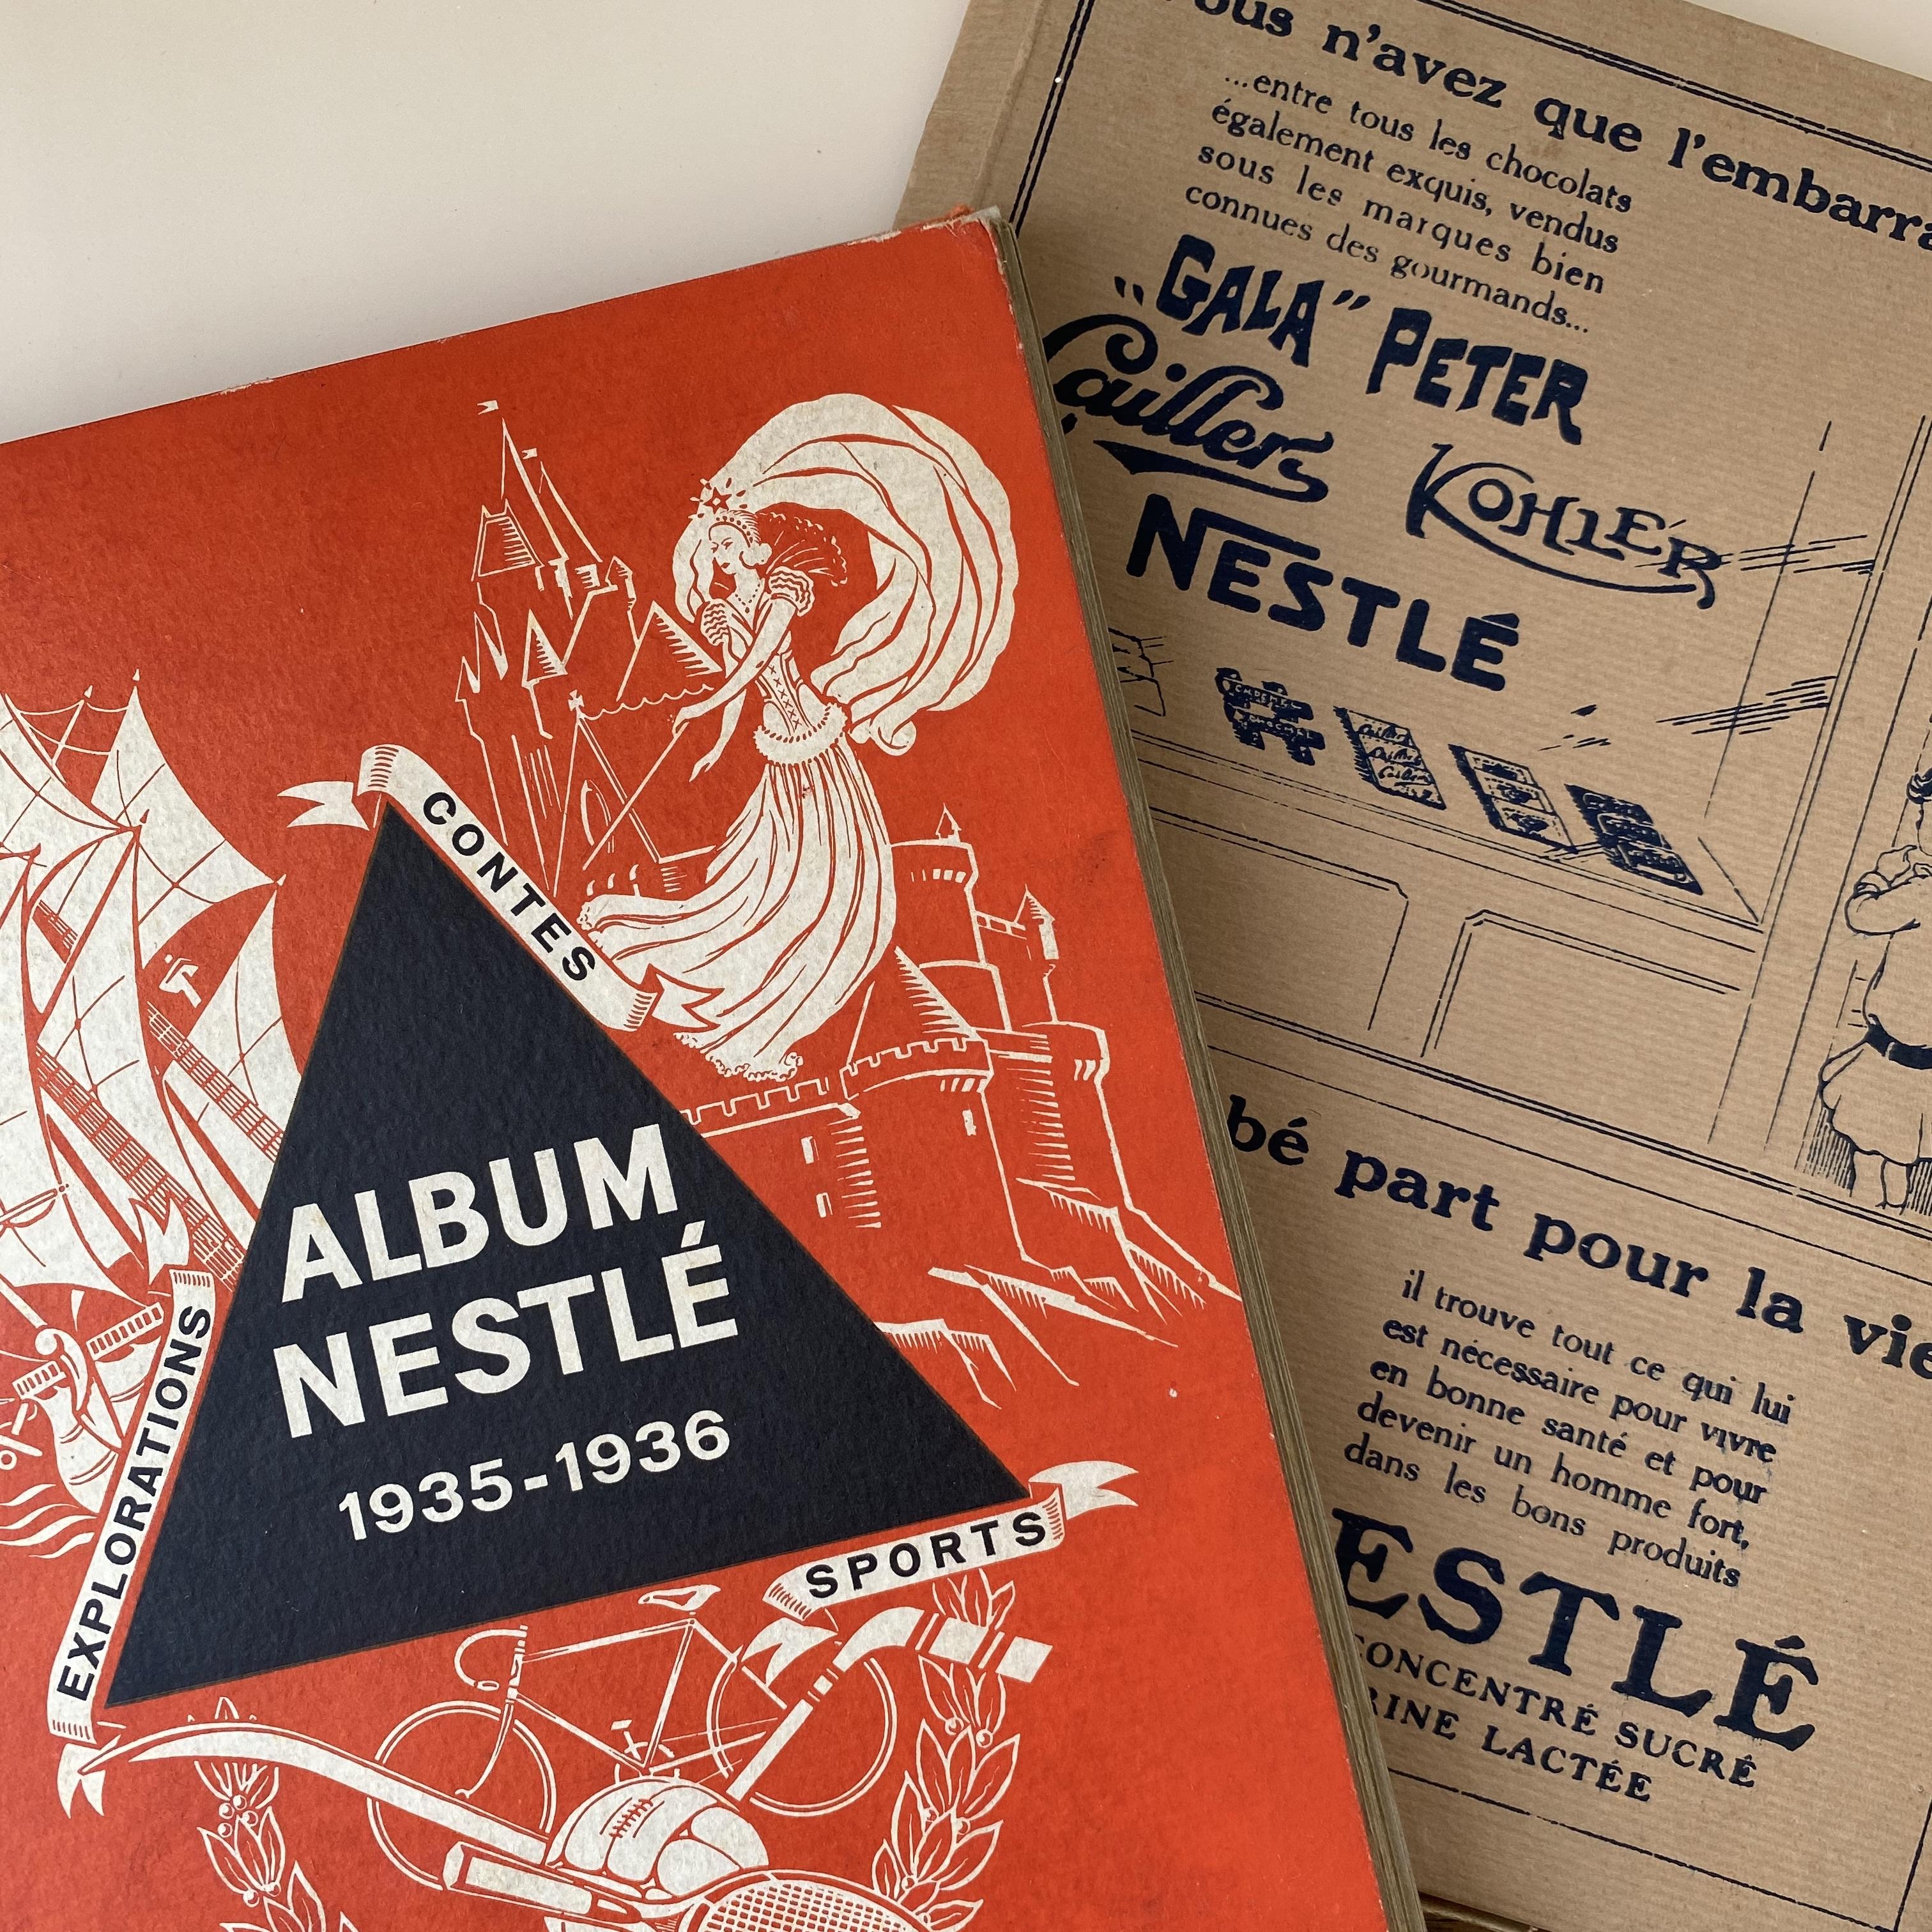 Nestlé おまけカードアルバム 1935-1936  / vp0106